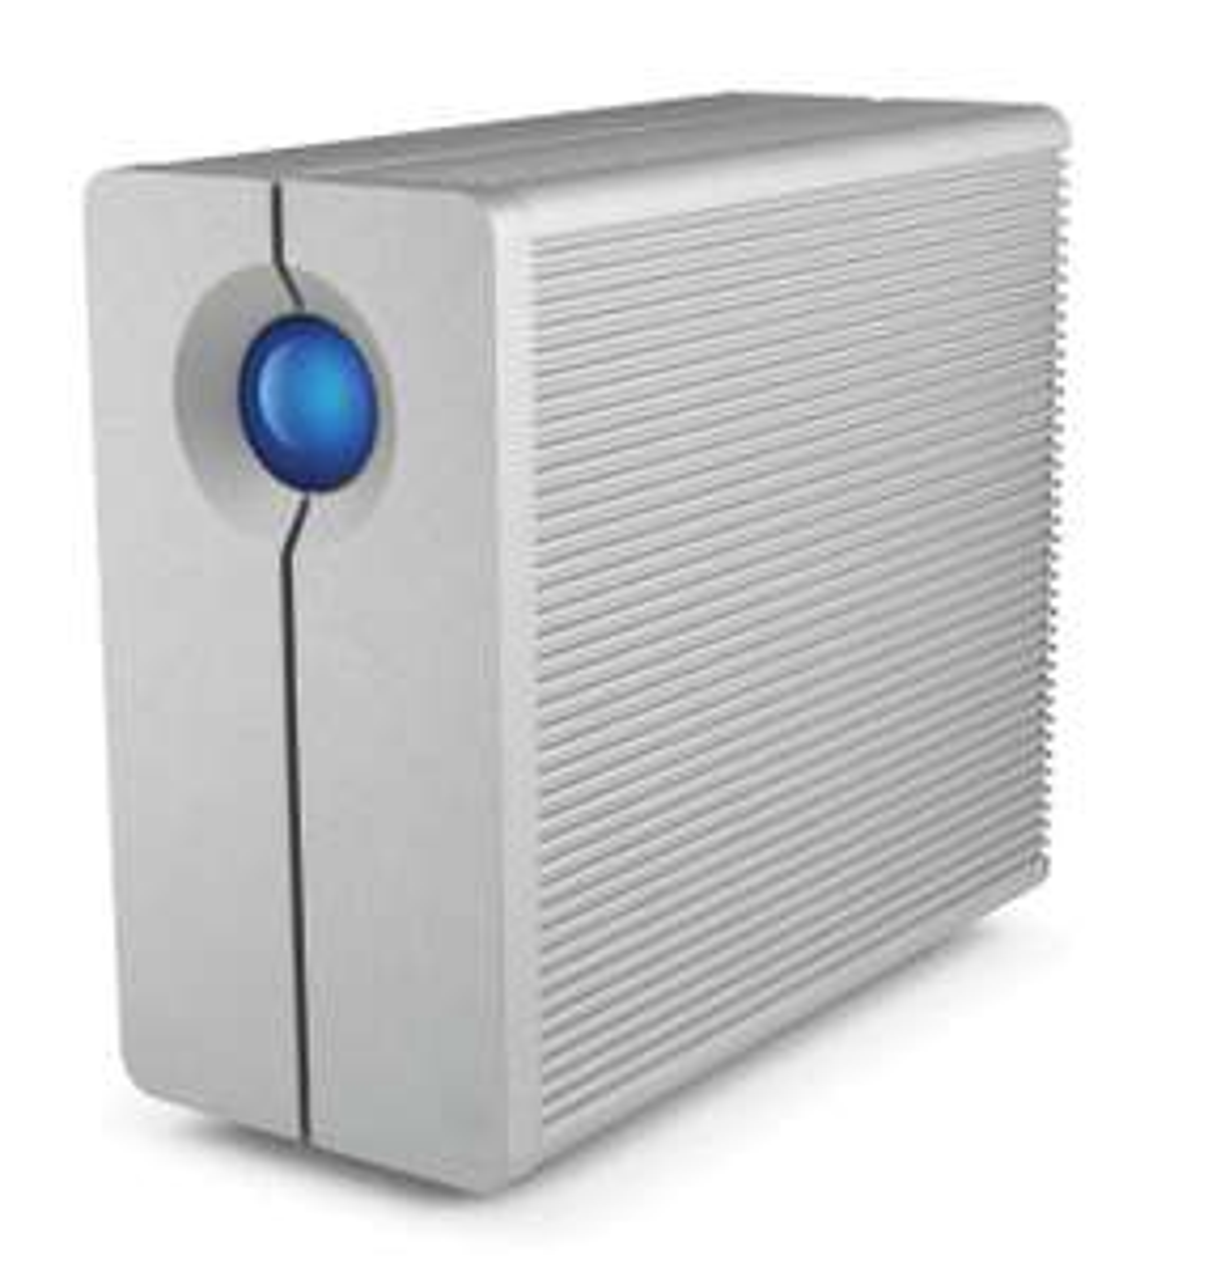 Dispositif de stockage externe LaCie 2big Quadra 10To (2 x 5To)